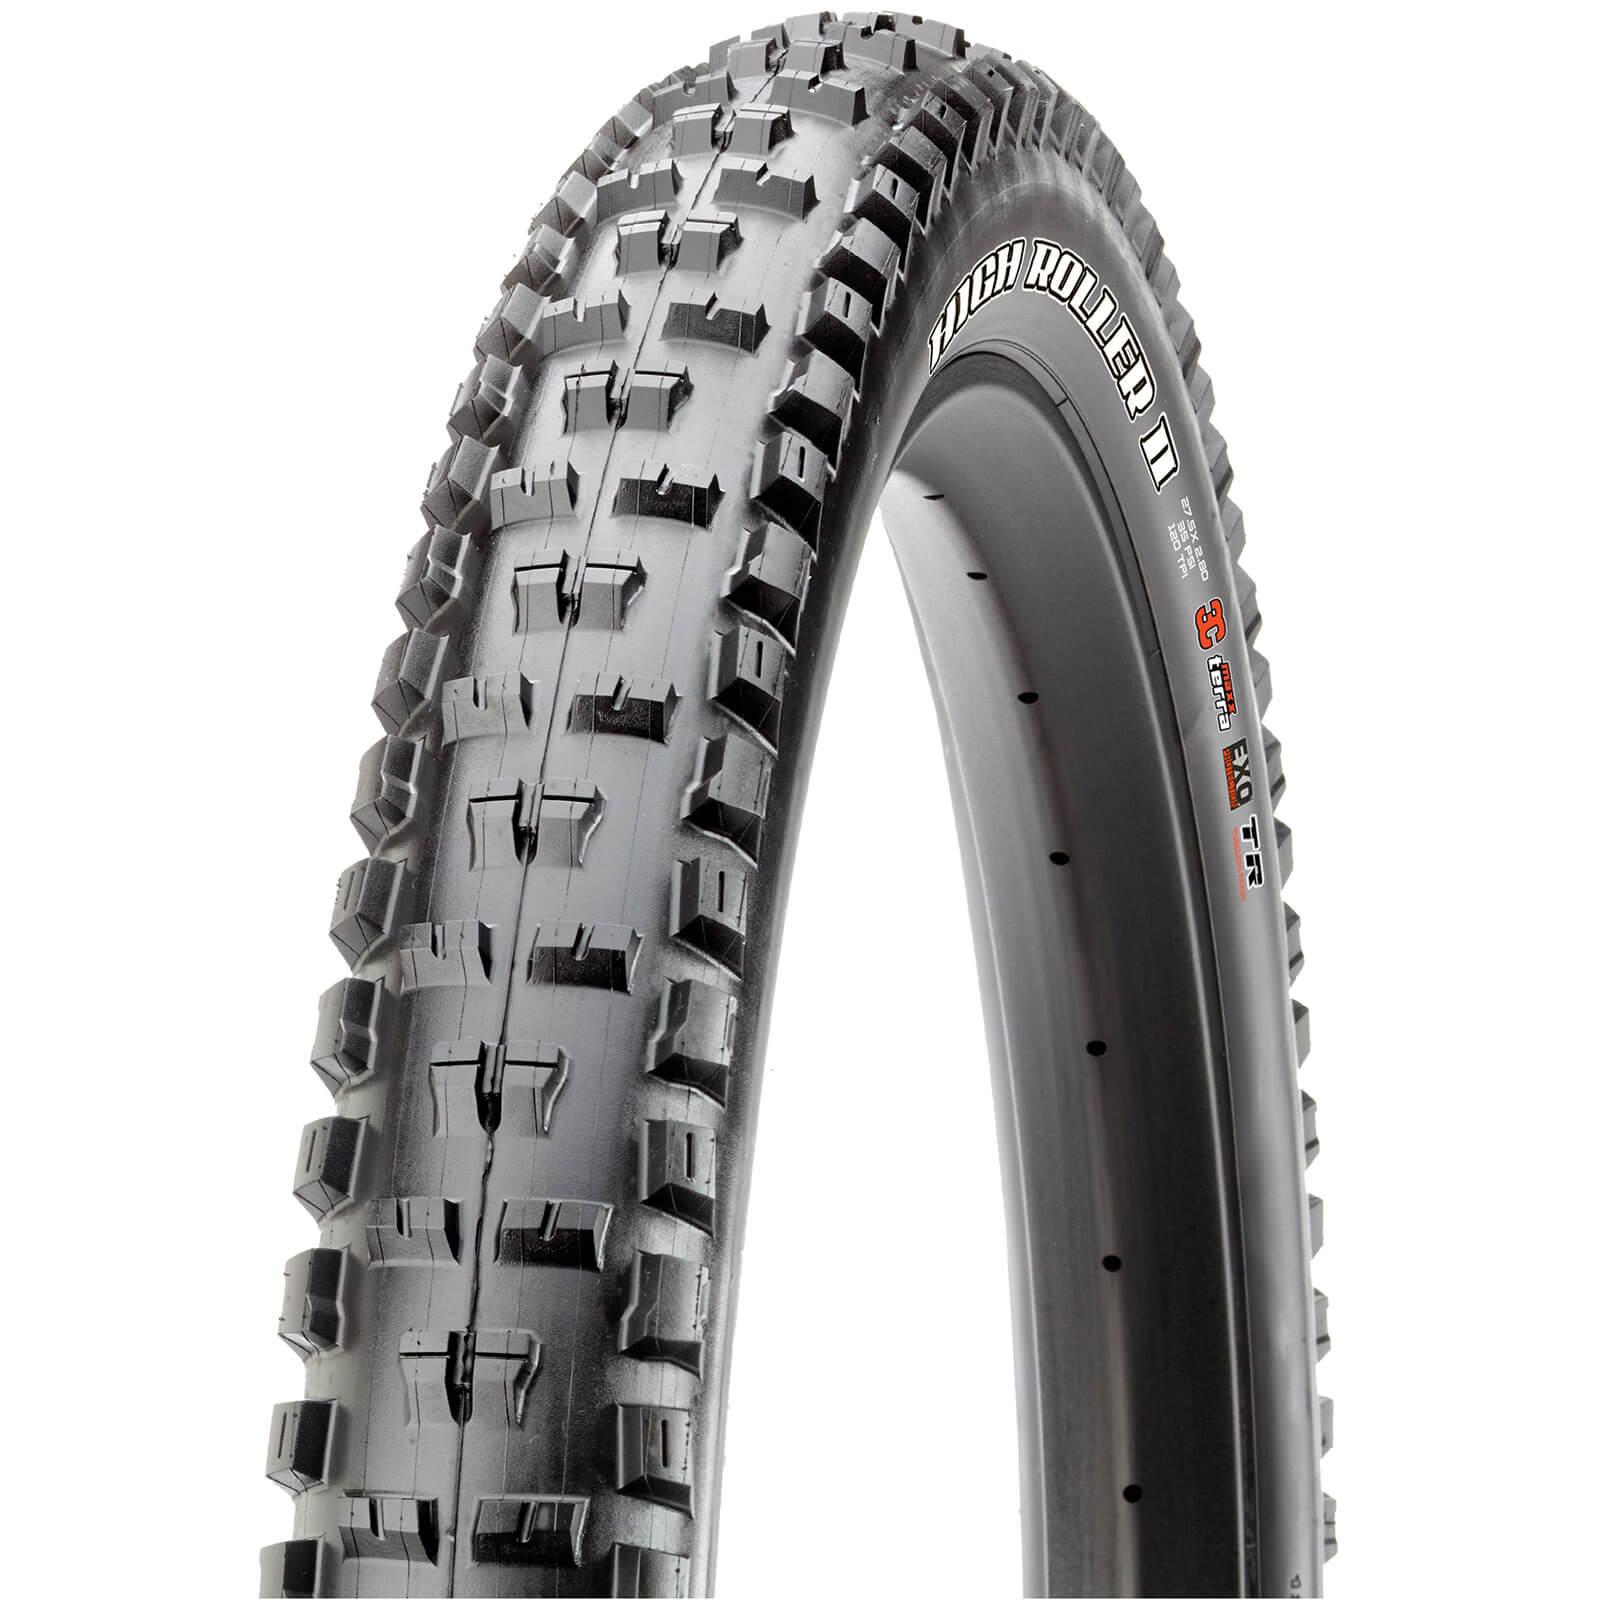 Maxxis High Roller II+ Folding 3C TR EXO Tire - 27.5in x 2.80in